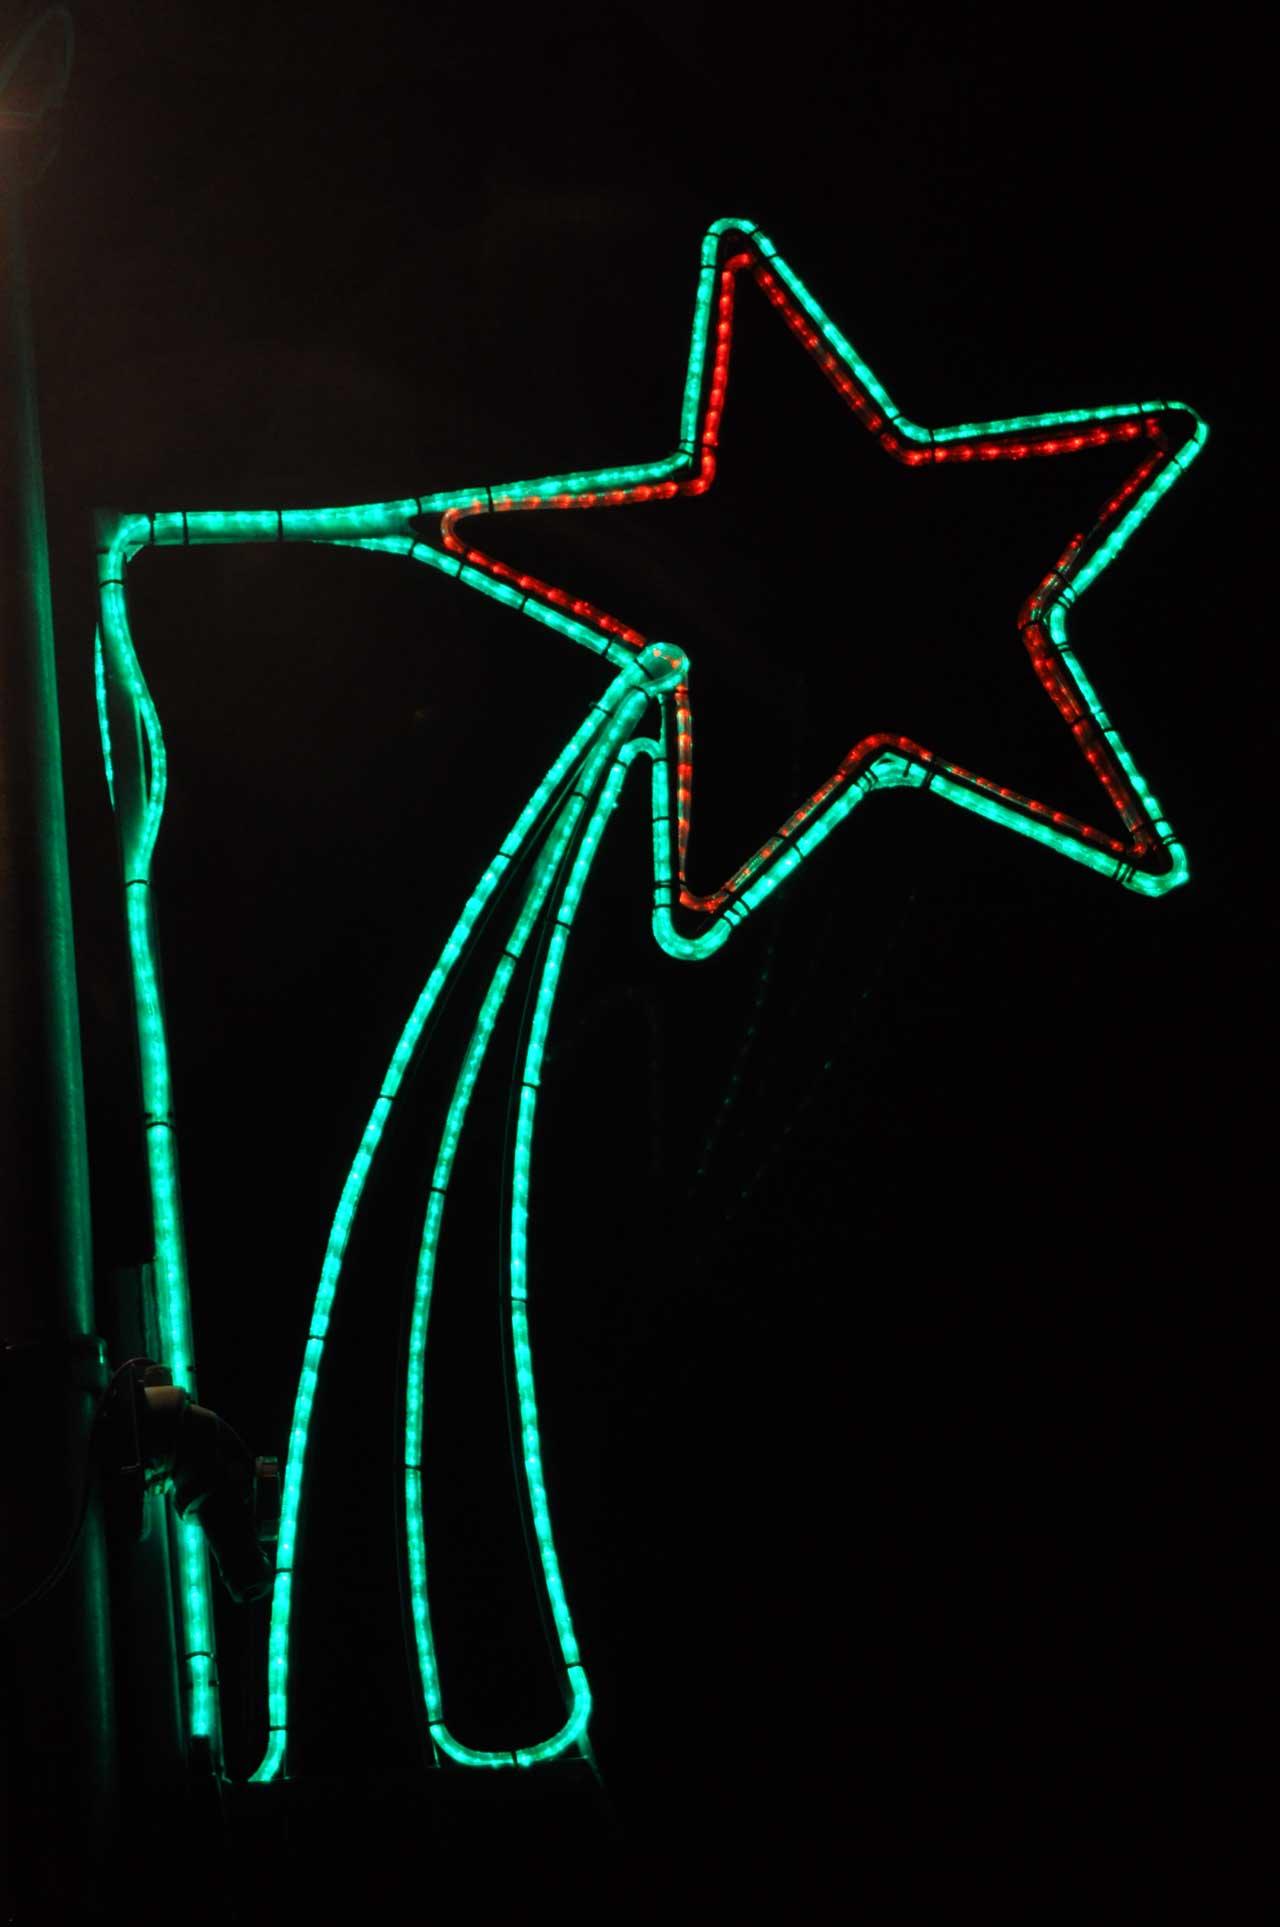 Photo: Keiss Christmas Lights Brighten The Rural Scene